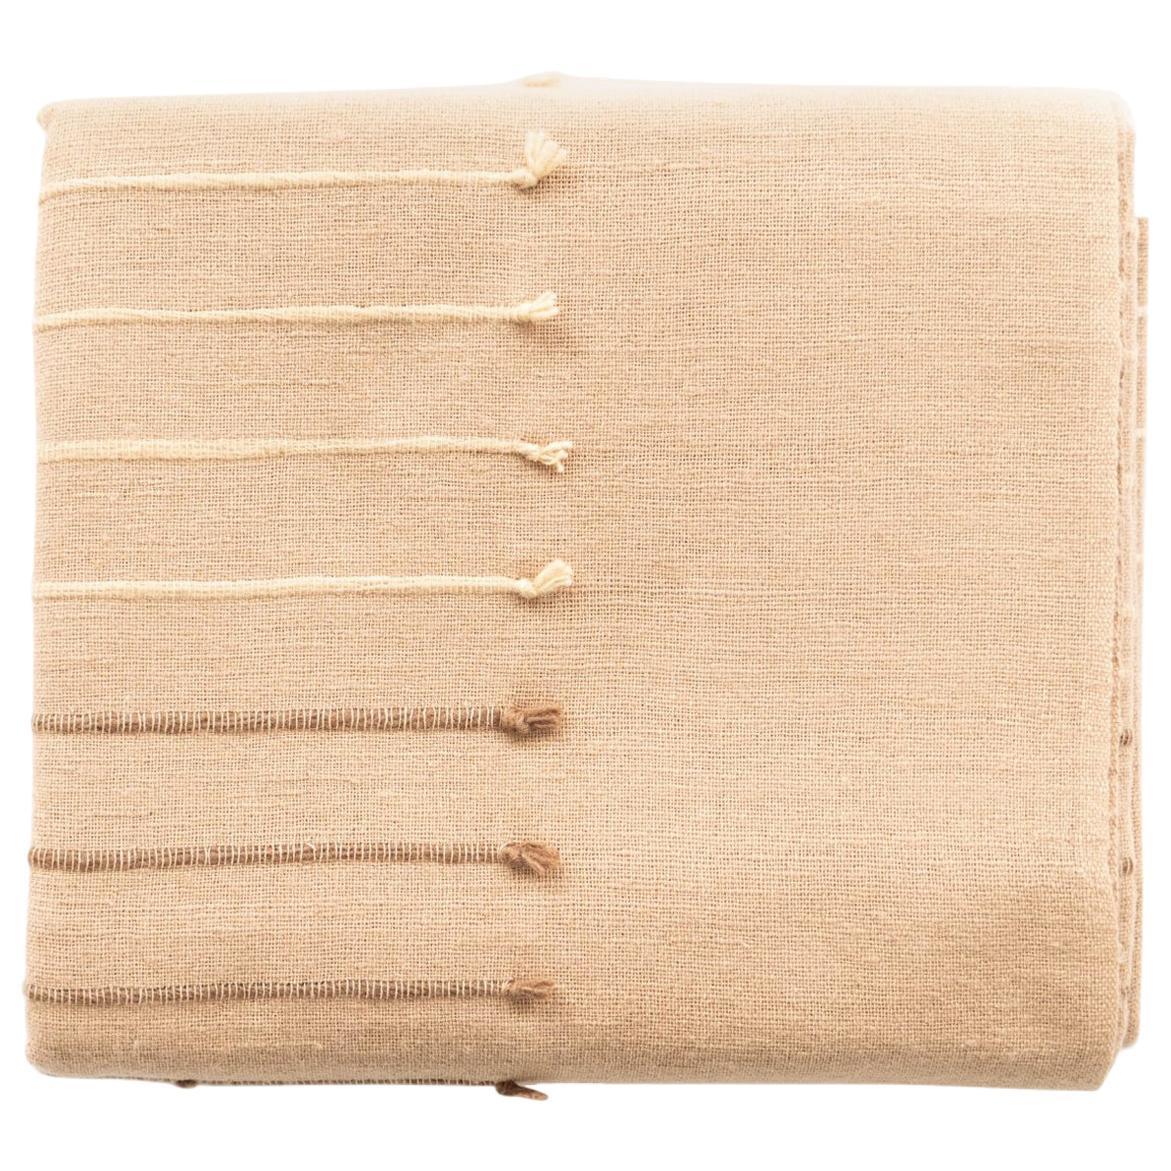 TERRA Handloom King Size Bedspread / Coverlet In Stripes Design, Neutral Color